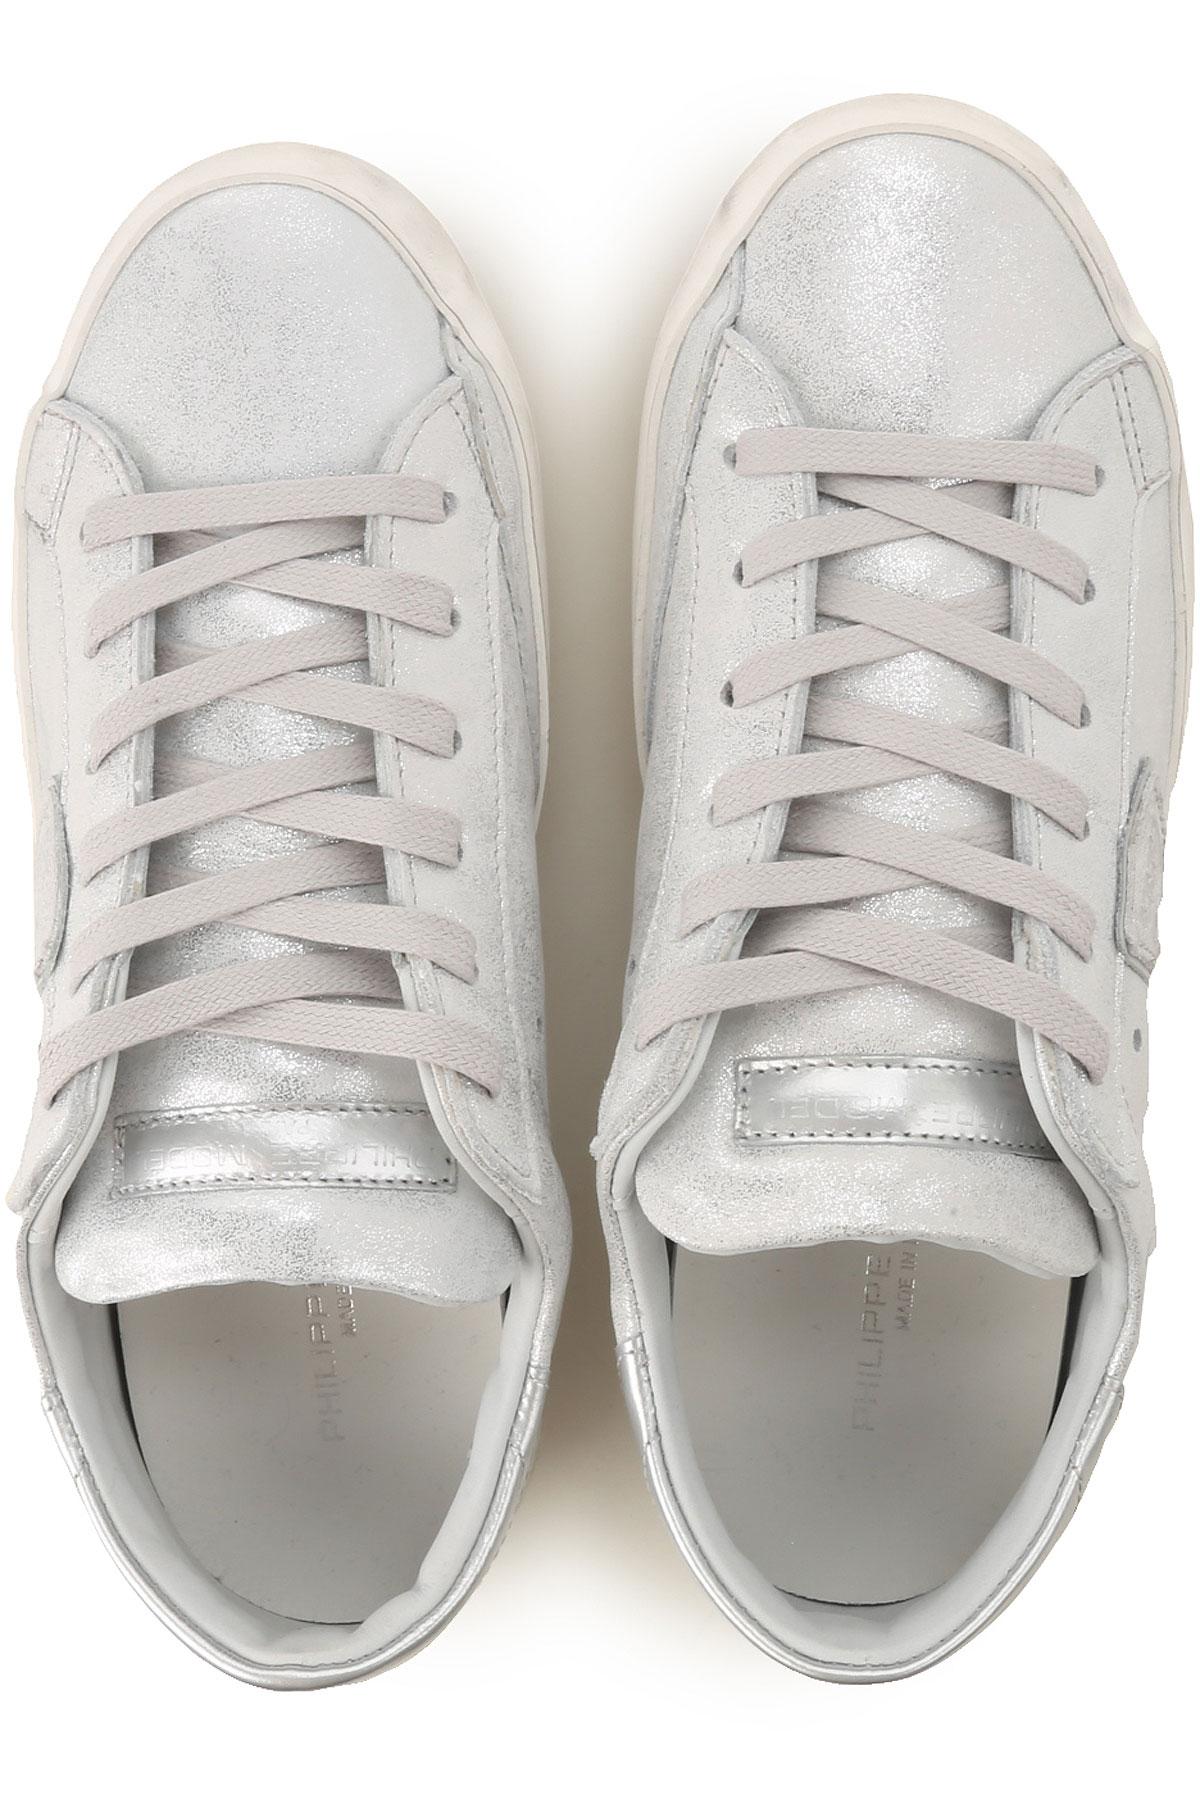 nbsp; Zapatos 2019 Primavera Para Philippe Mujer Model Plata verano SHqAnw8C